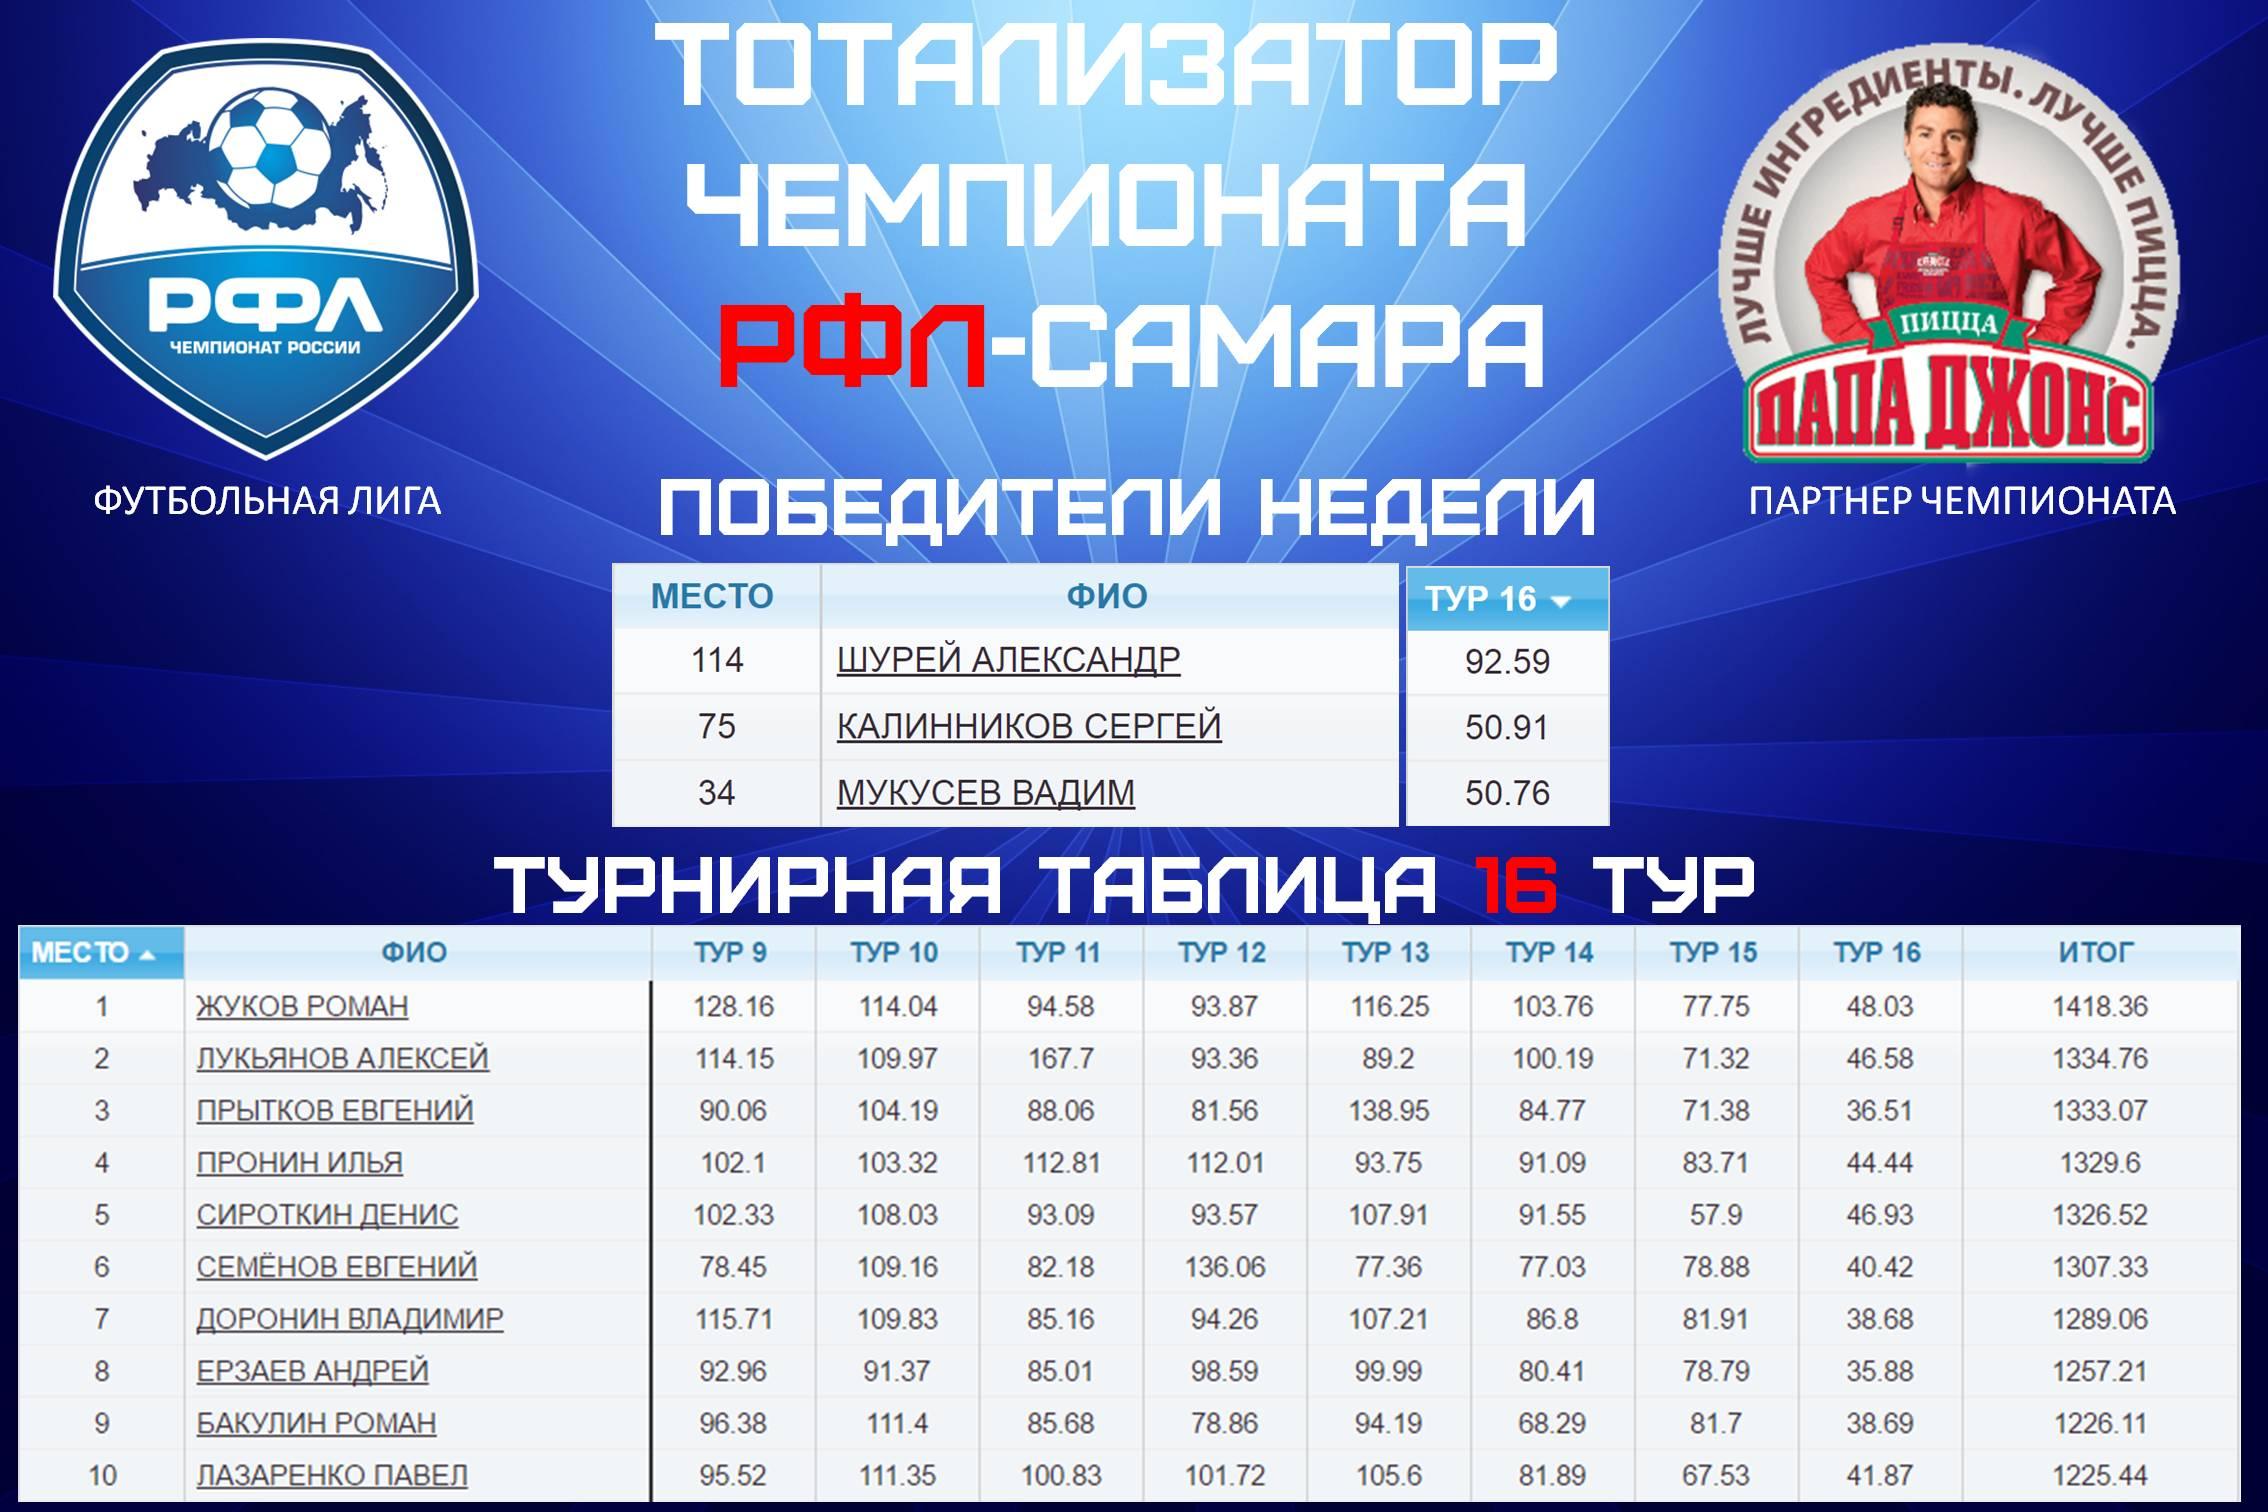 тотализатор лига ставка